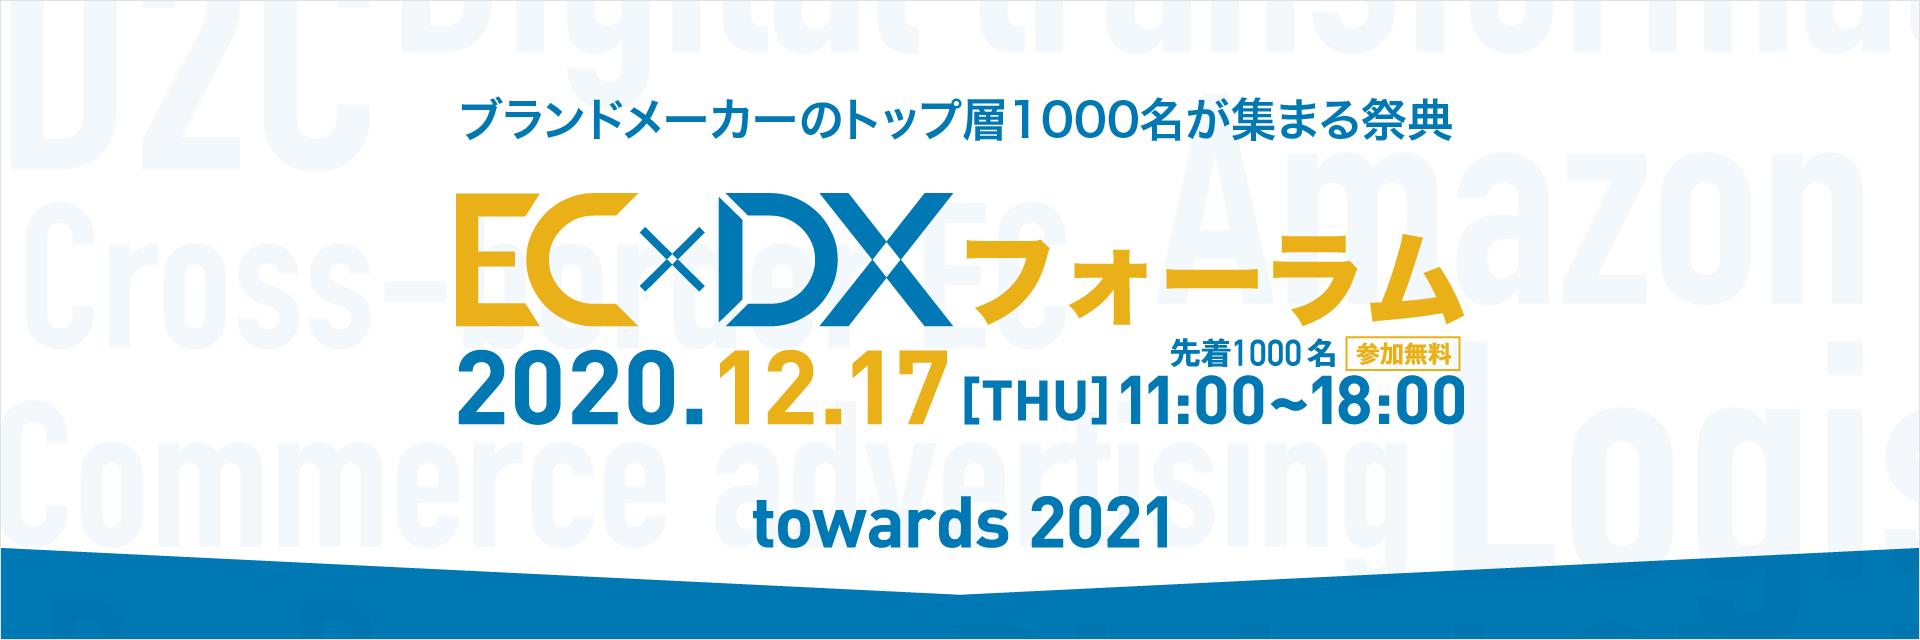 ECxDXフォーラム towards2021